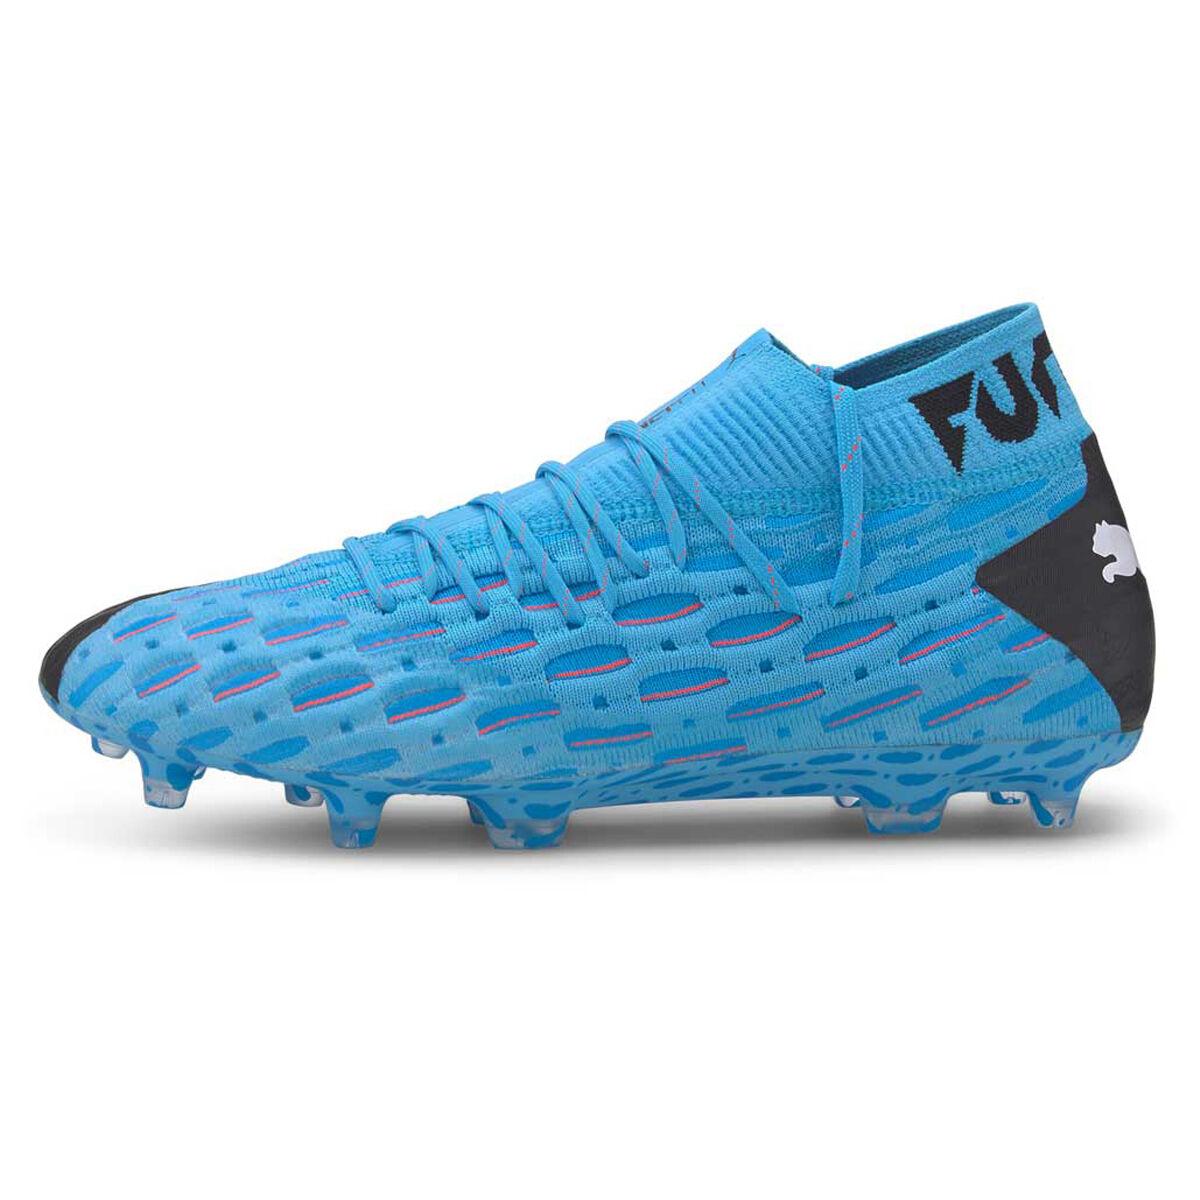 Puma Future 5.1 Netfit Football Boots